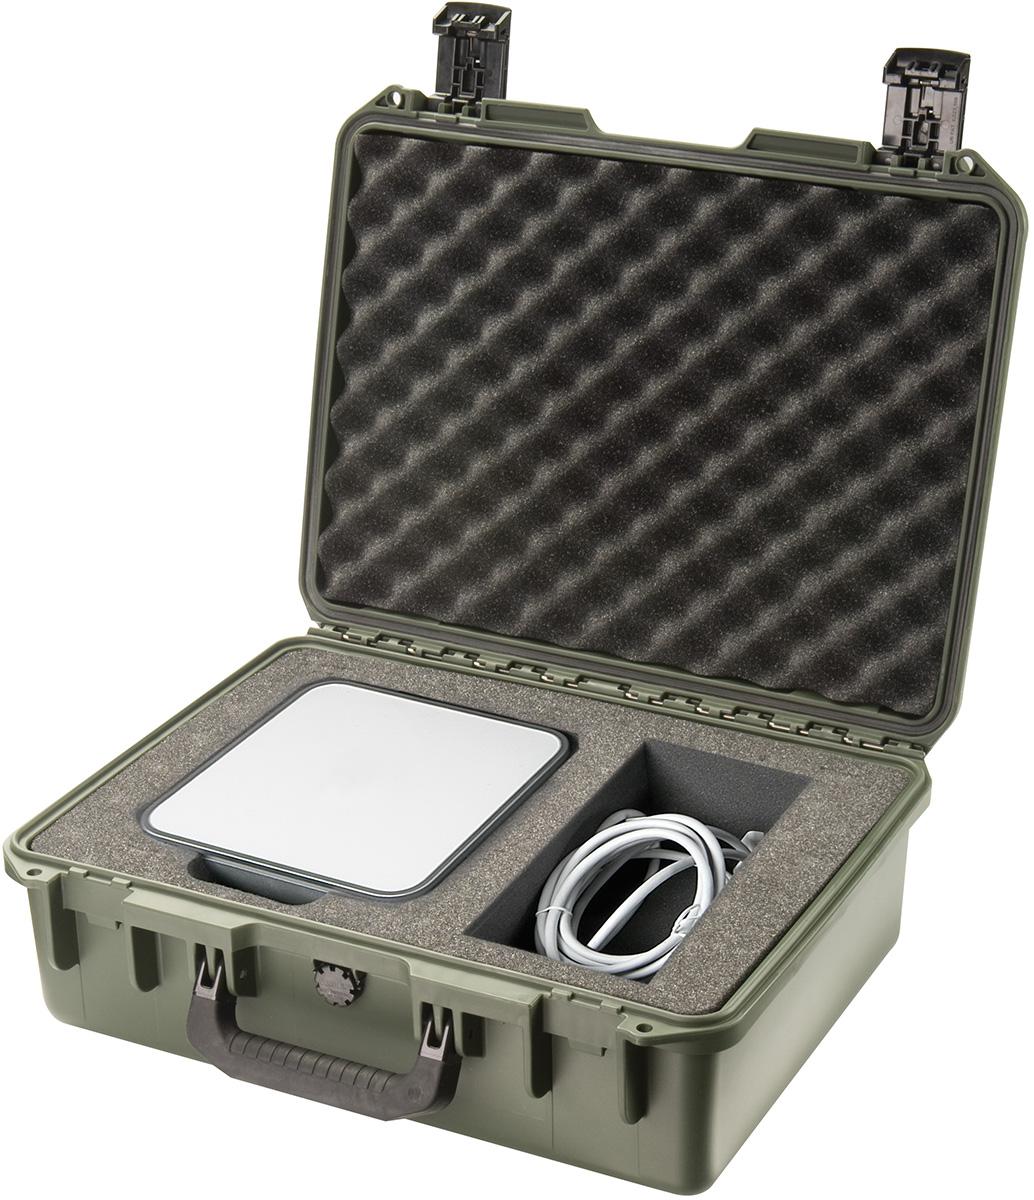 pelican im2400 hardigg storm 2400 hard case